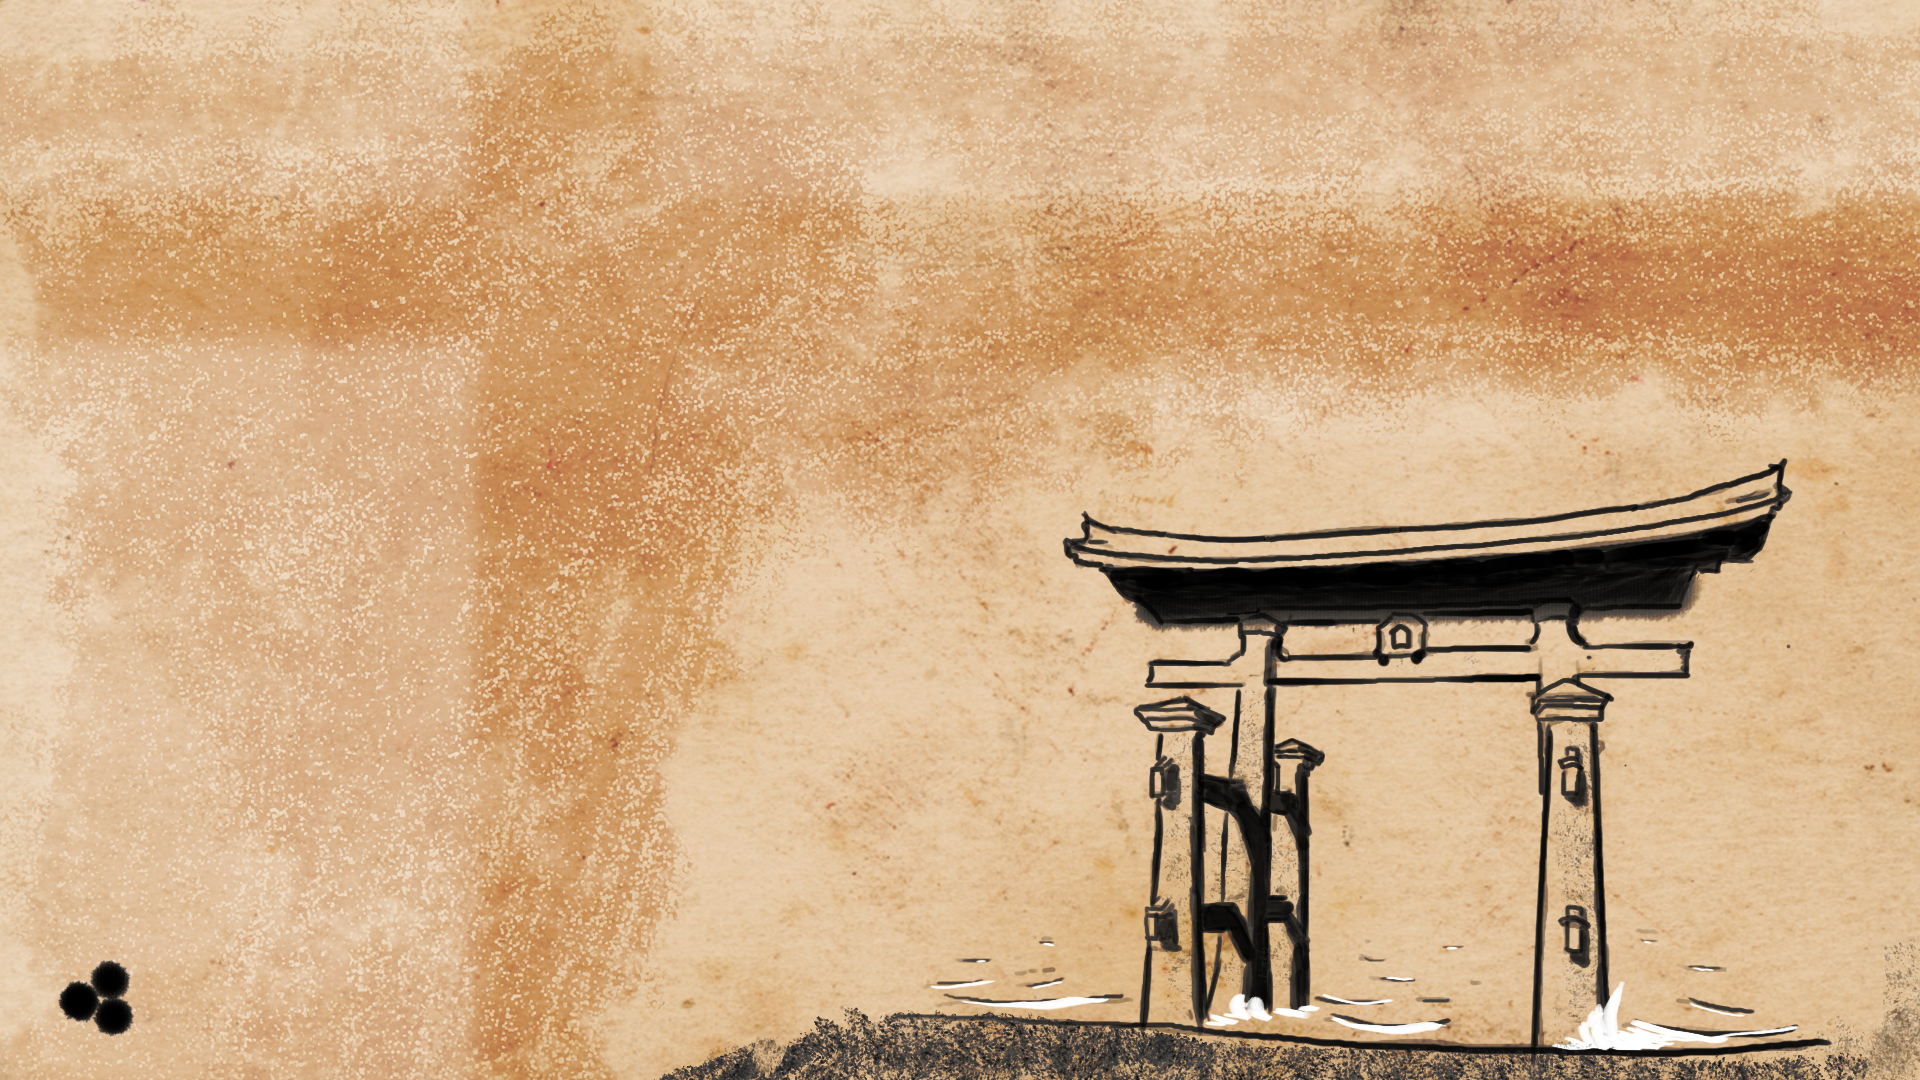 Japanese Art Wallpapers 26 Japanese Art Wallpaper 1920x1080